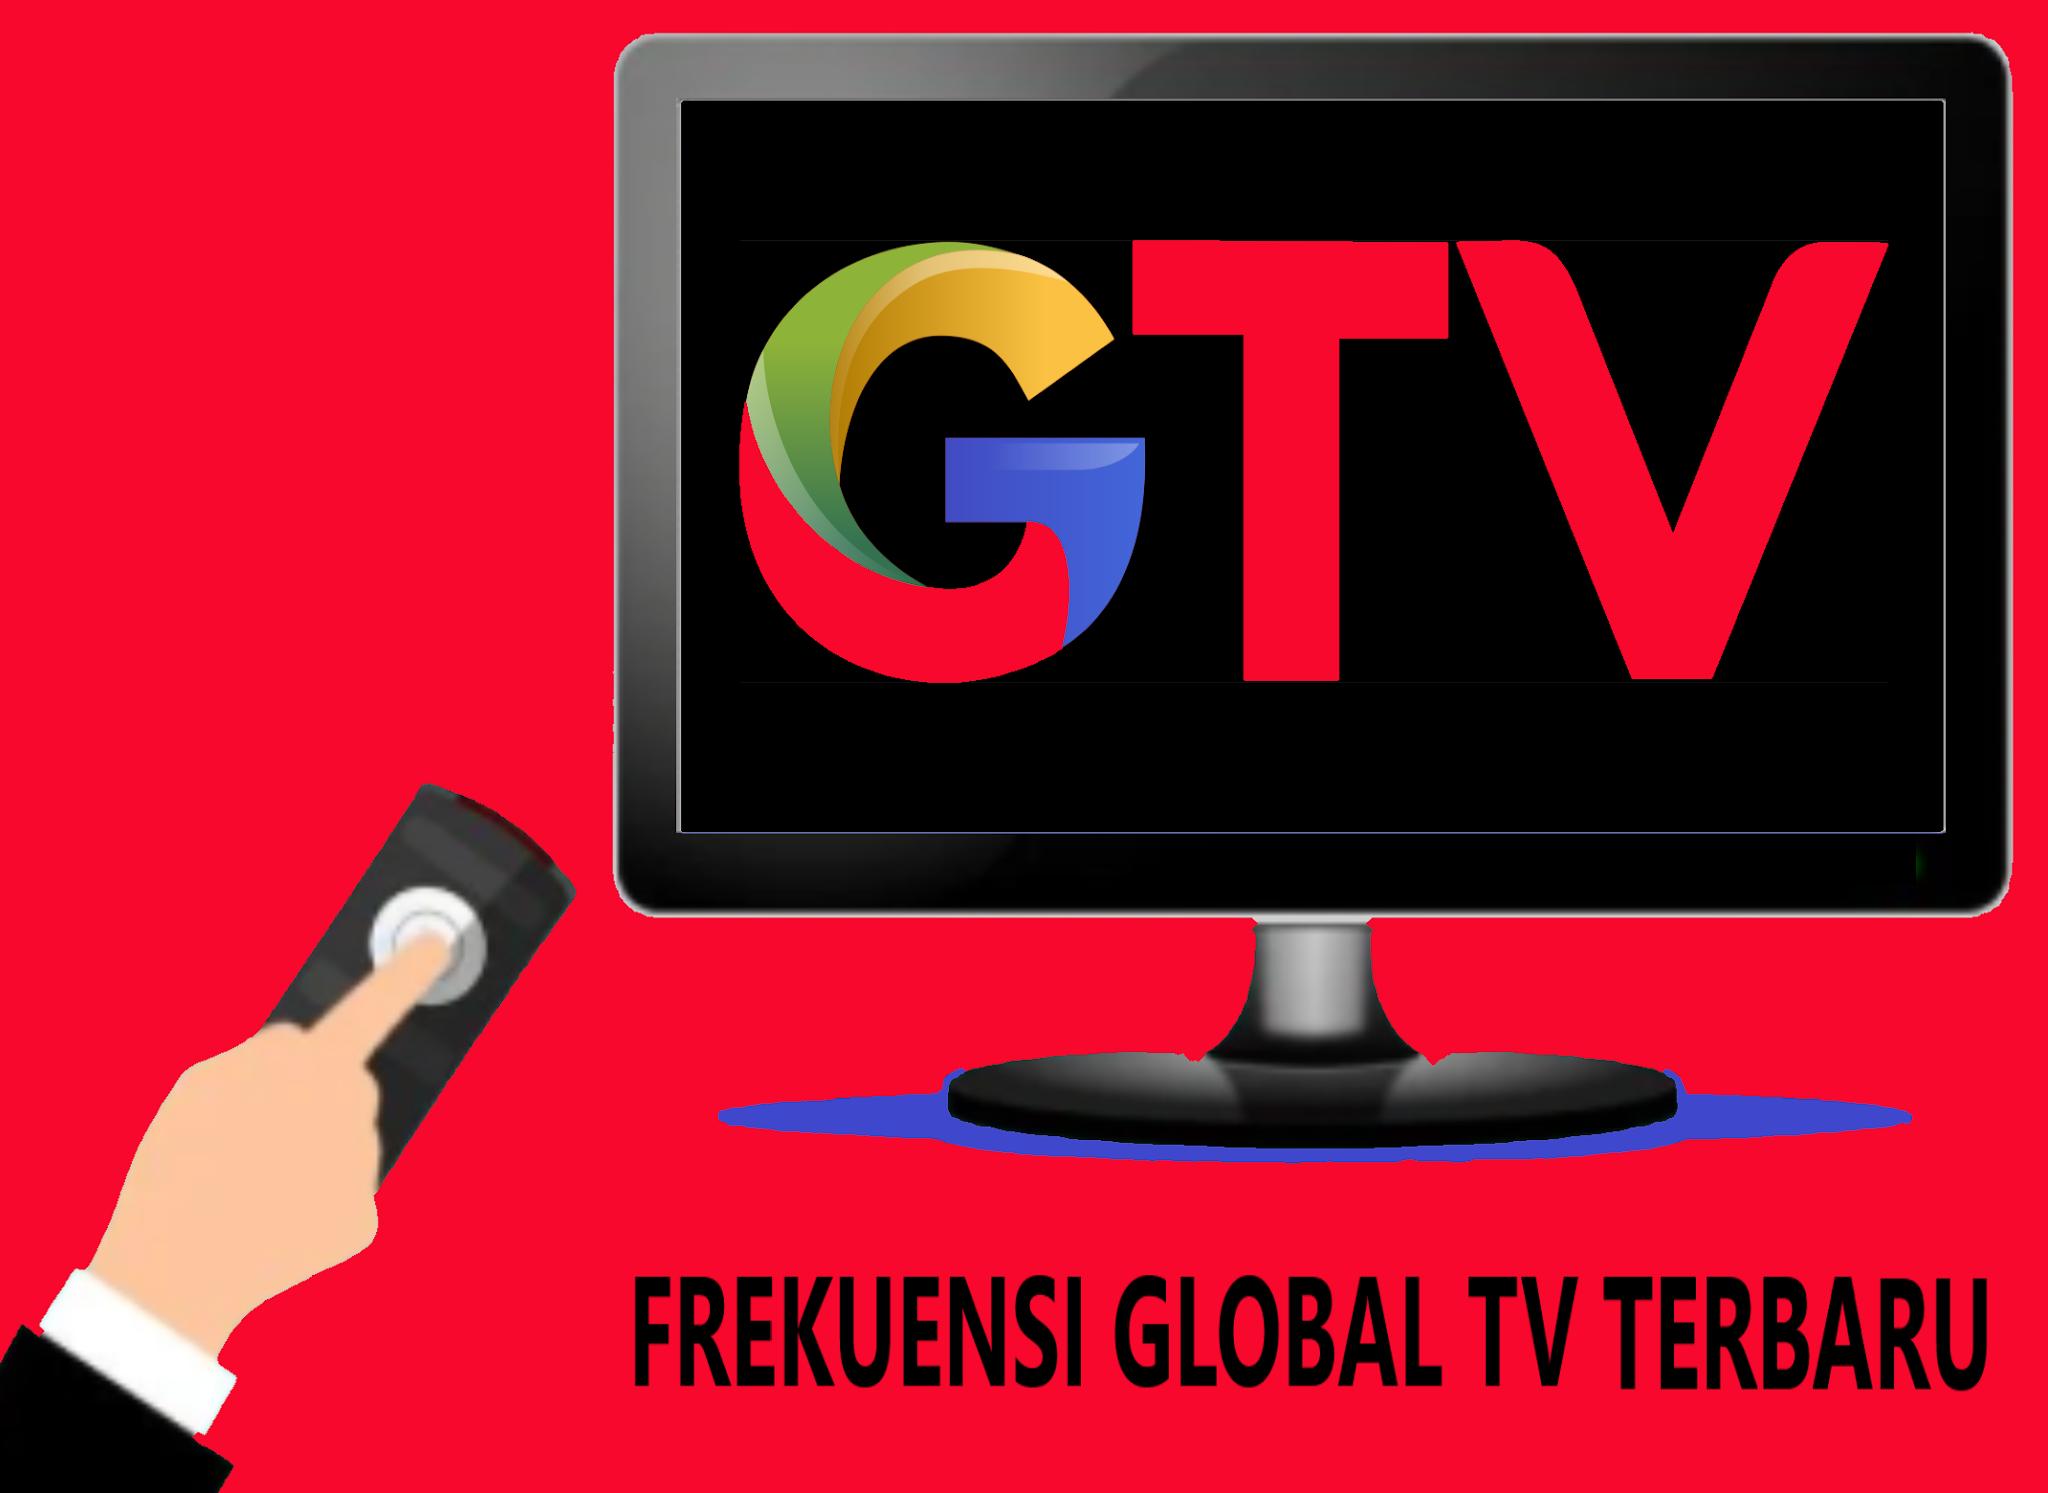 Frekuensi Global TV (GTV) Terbaru Di Telkom 4 Update 2020